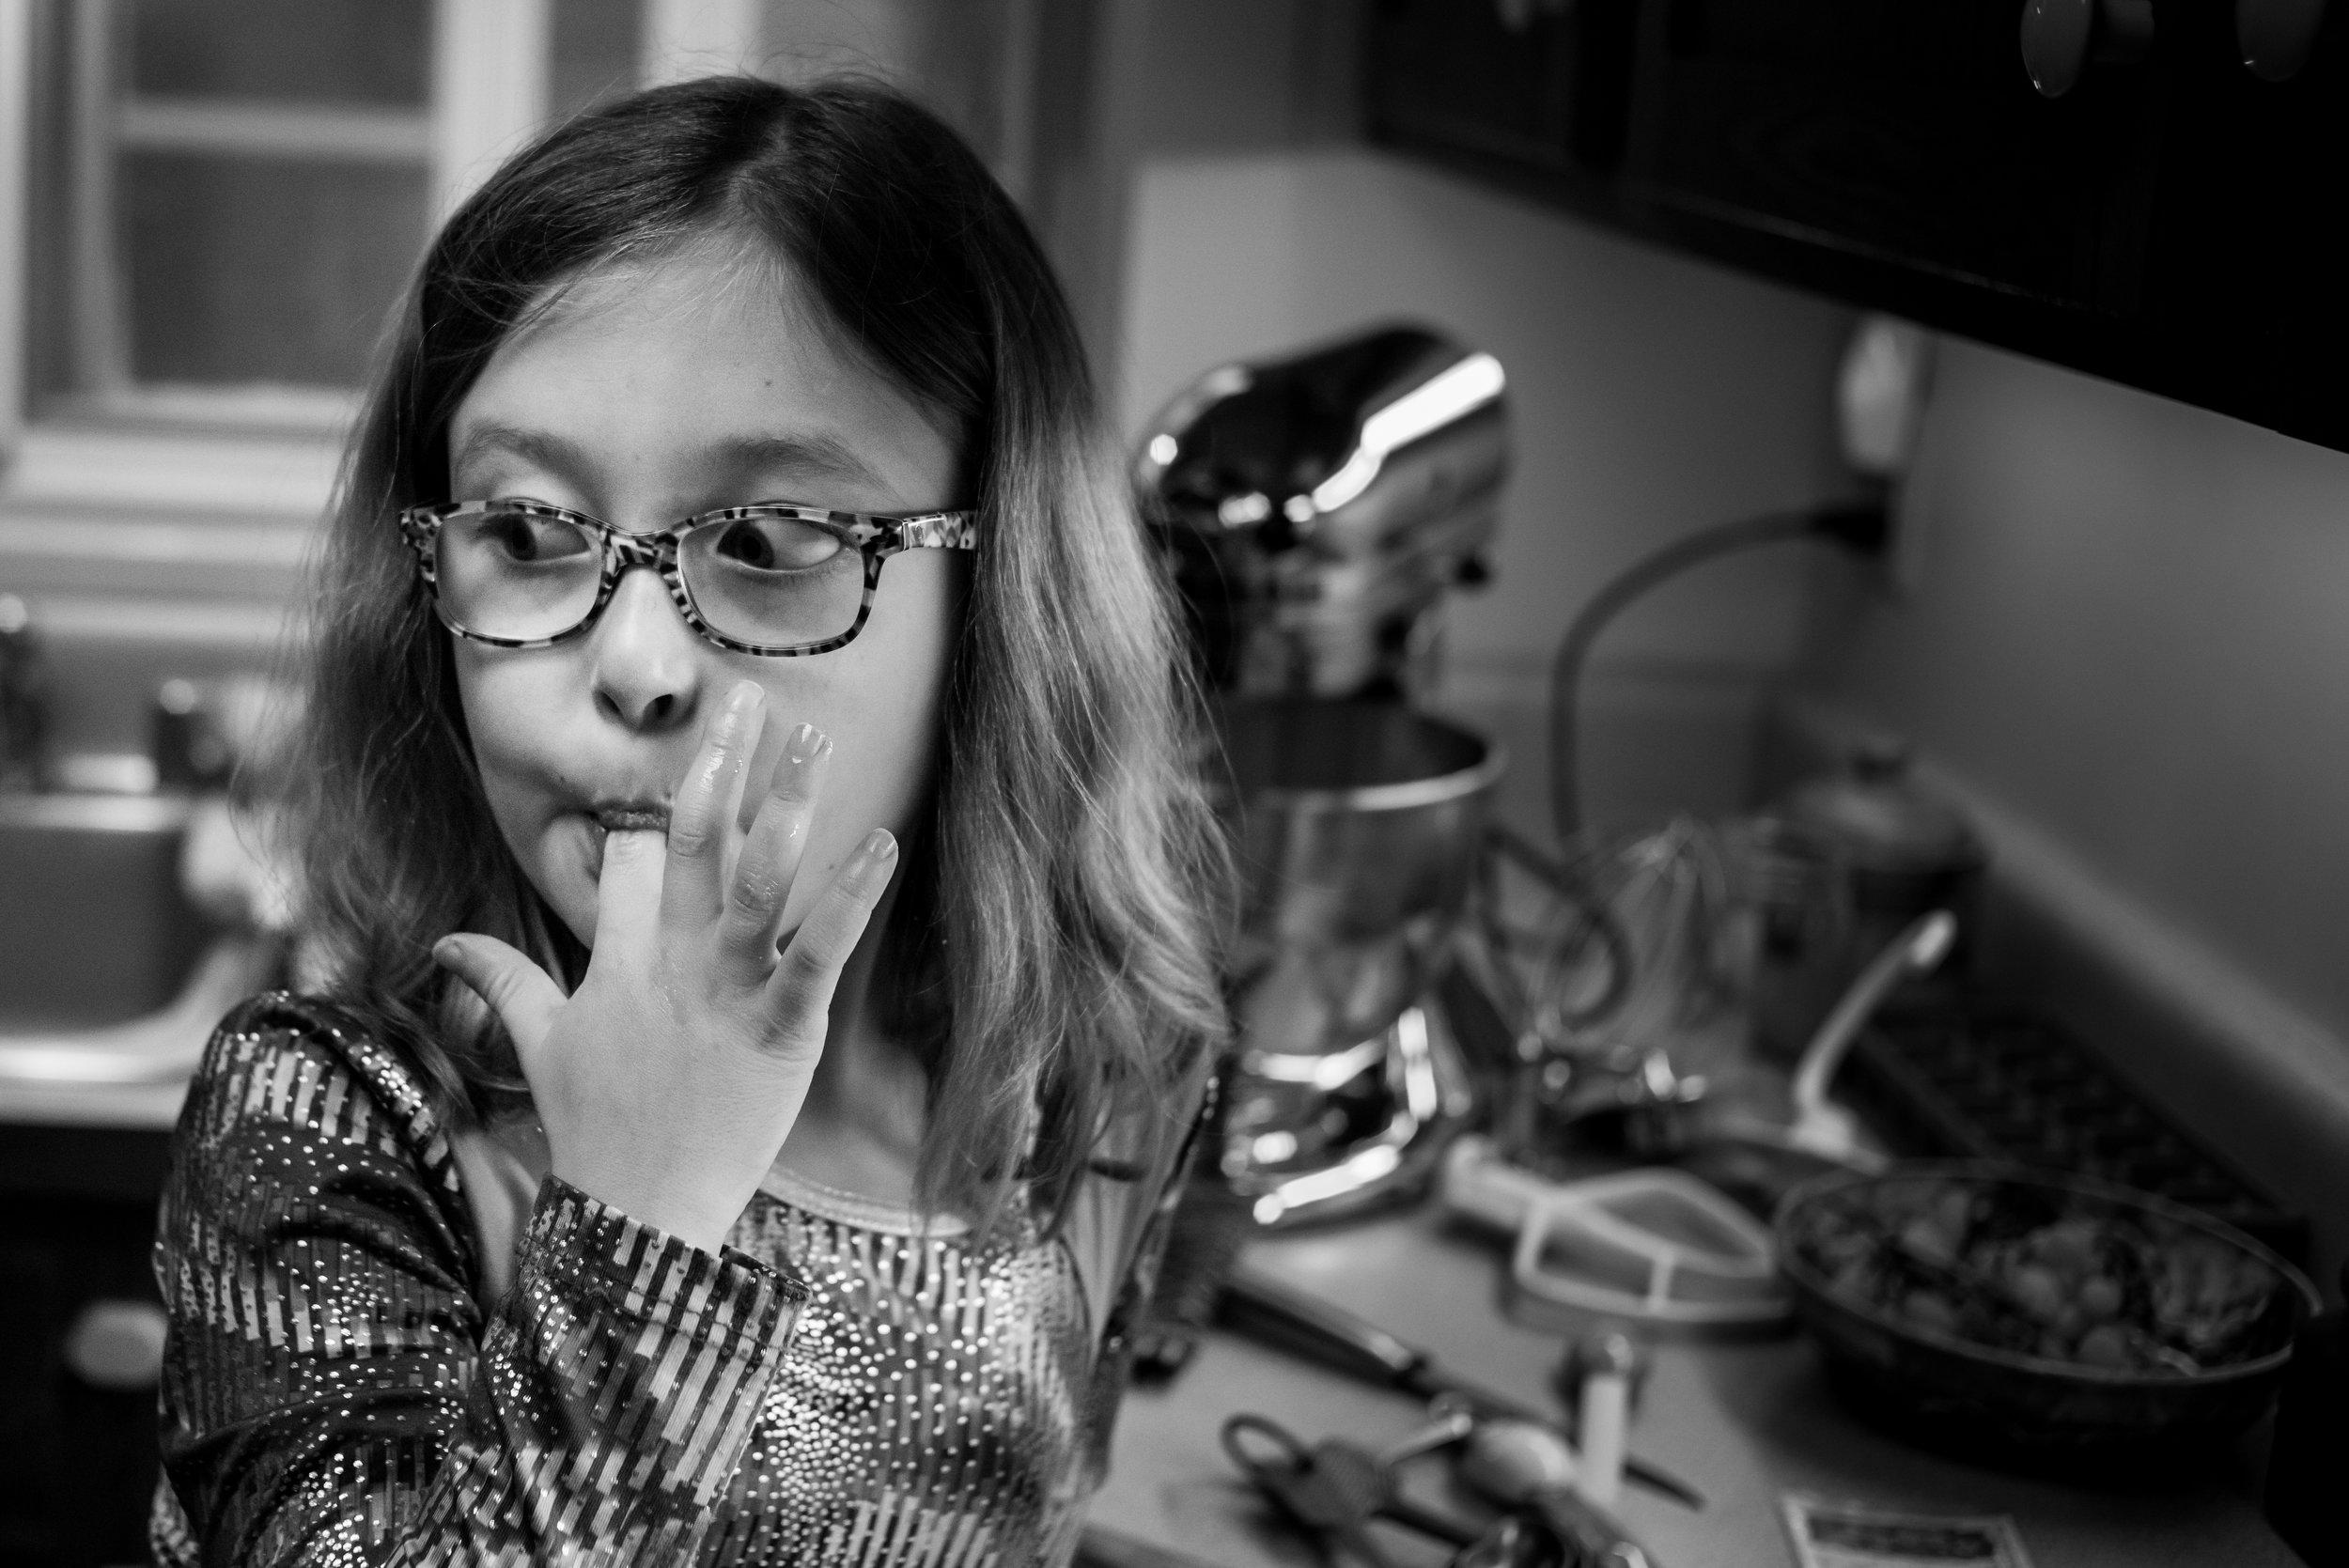 JuliaMatthewsPhotography_MadisonWisconsinFamilyPhotography_Documentary-8.jpg